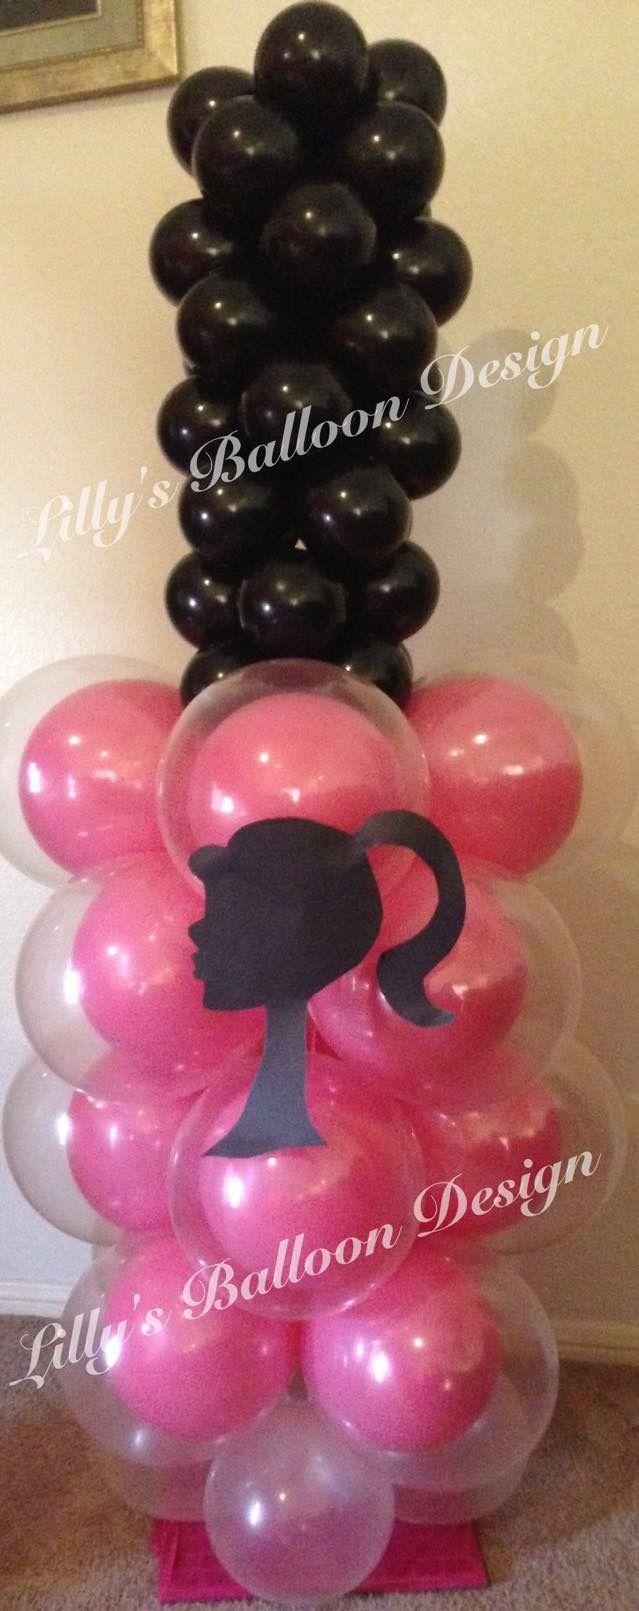 Barbie Nail polish balloon sculpture, birthday party balloons. Balloon barbie